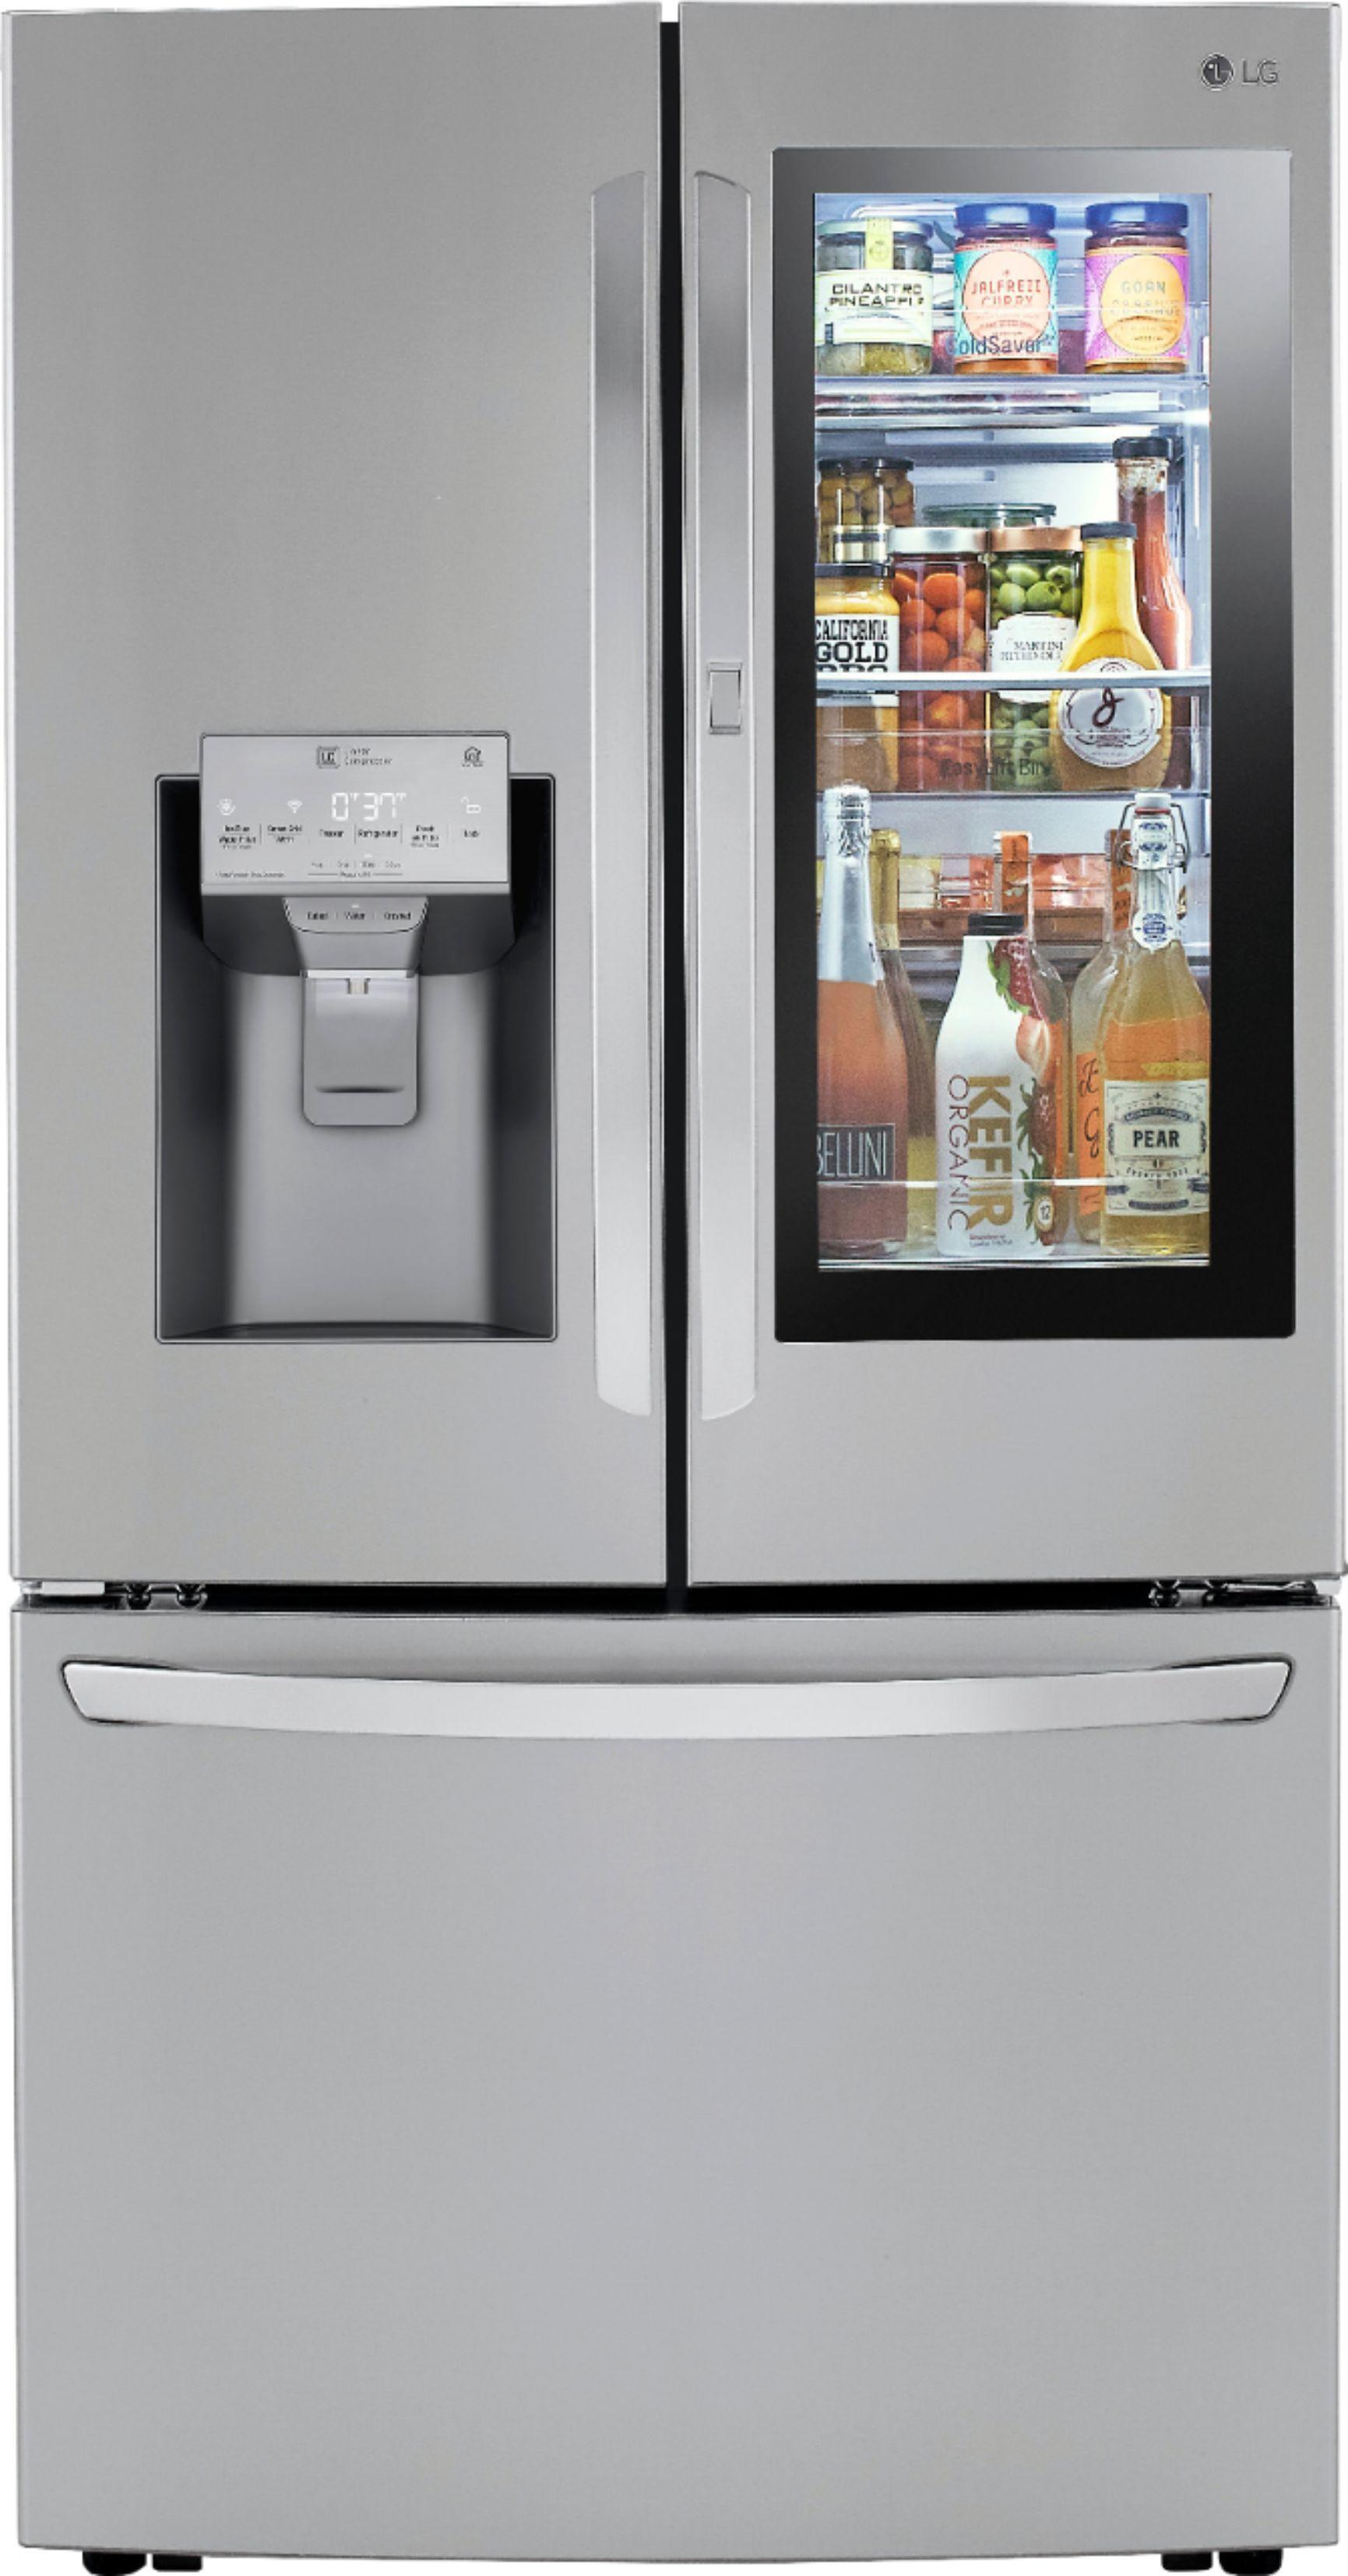 44+ Lg craft ice refrigerator dimensions ideas in 2021